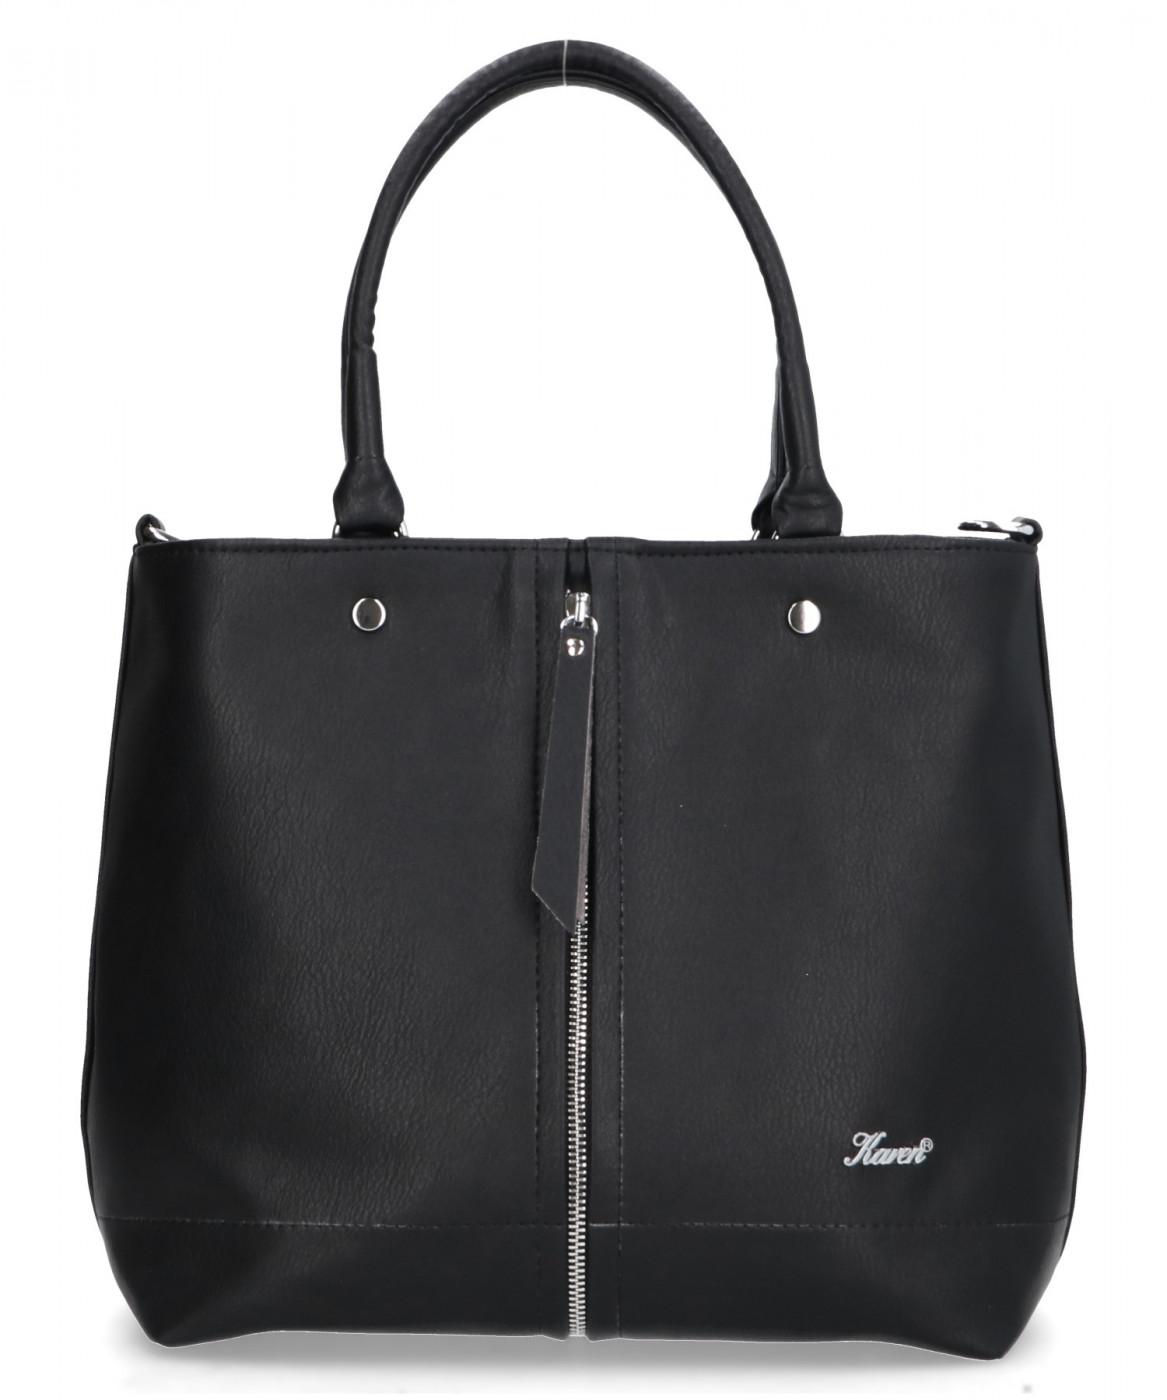 Karen Woman's Handbag 9307-Marion